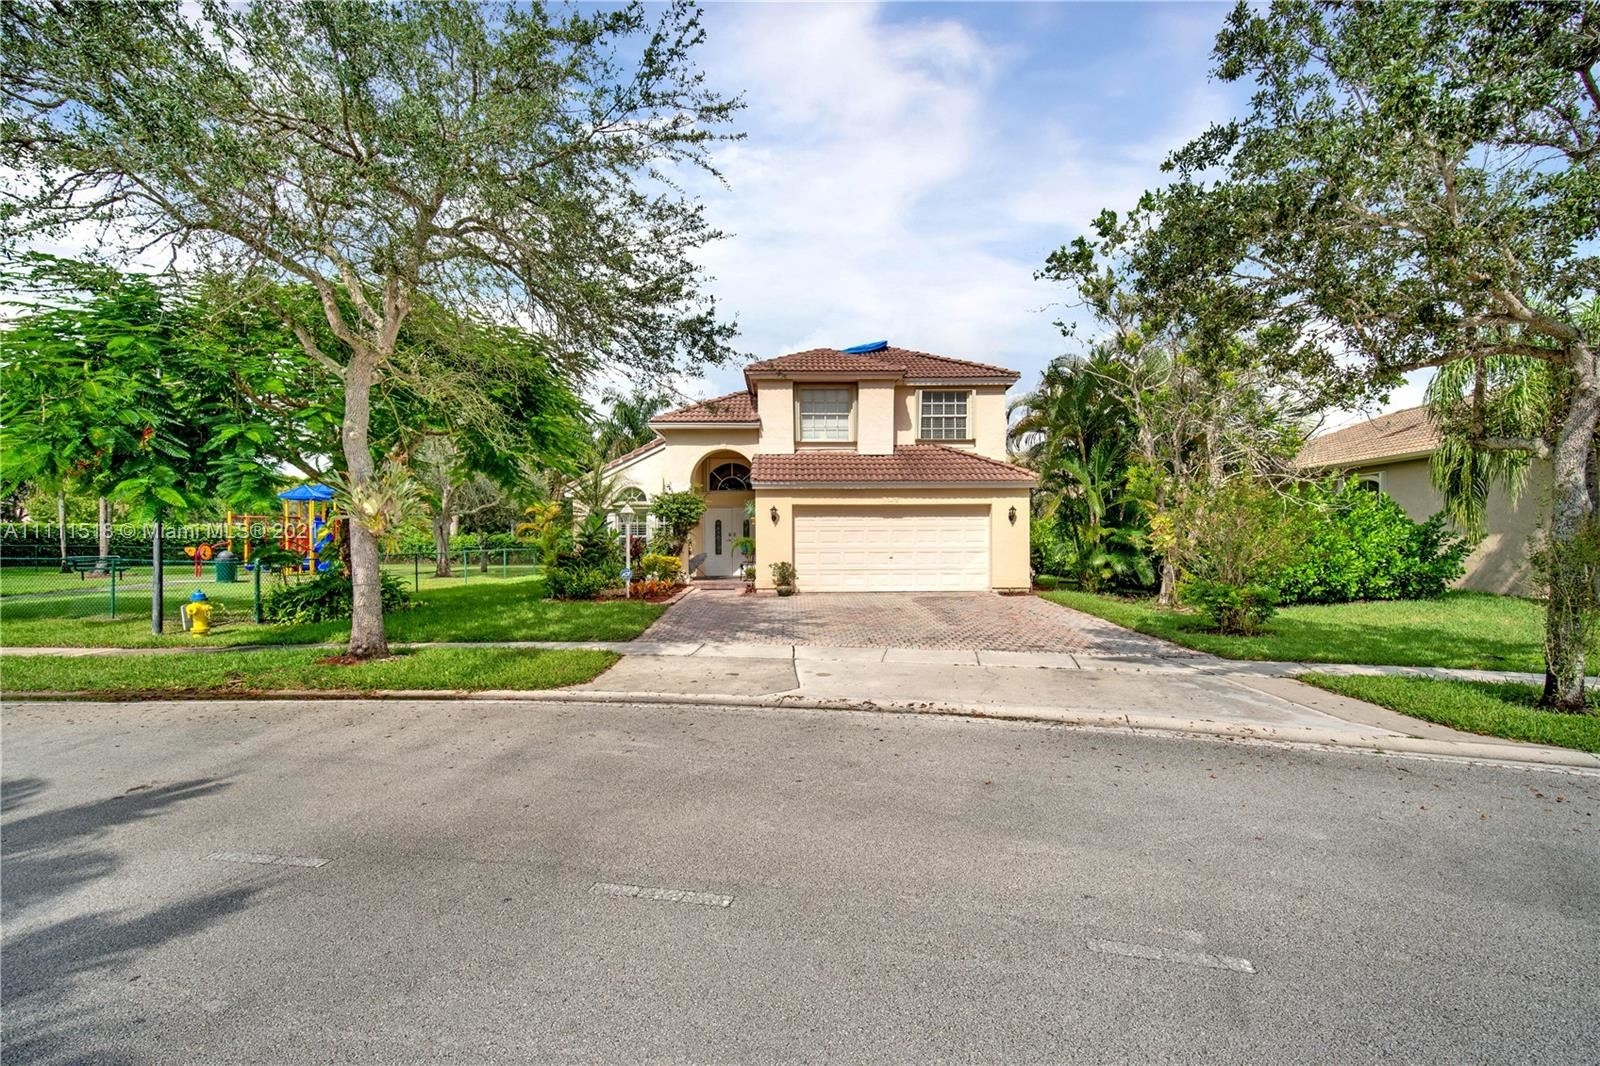 Photo of 13475 NW 12th St, Pembroke Pines, FL 33028 (MLS # A11111518)